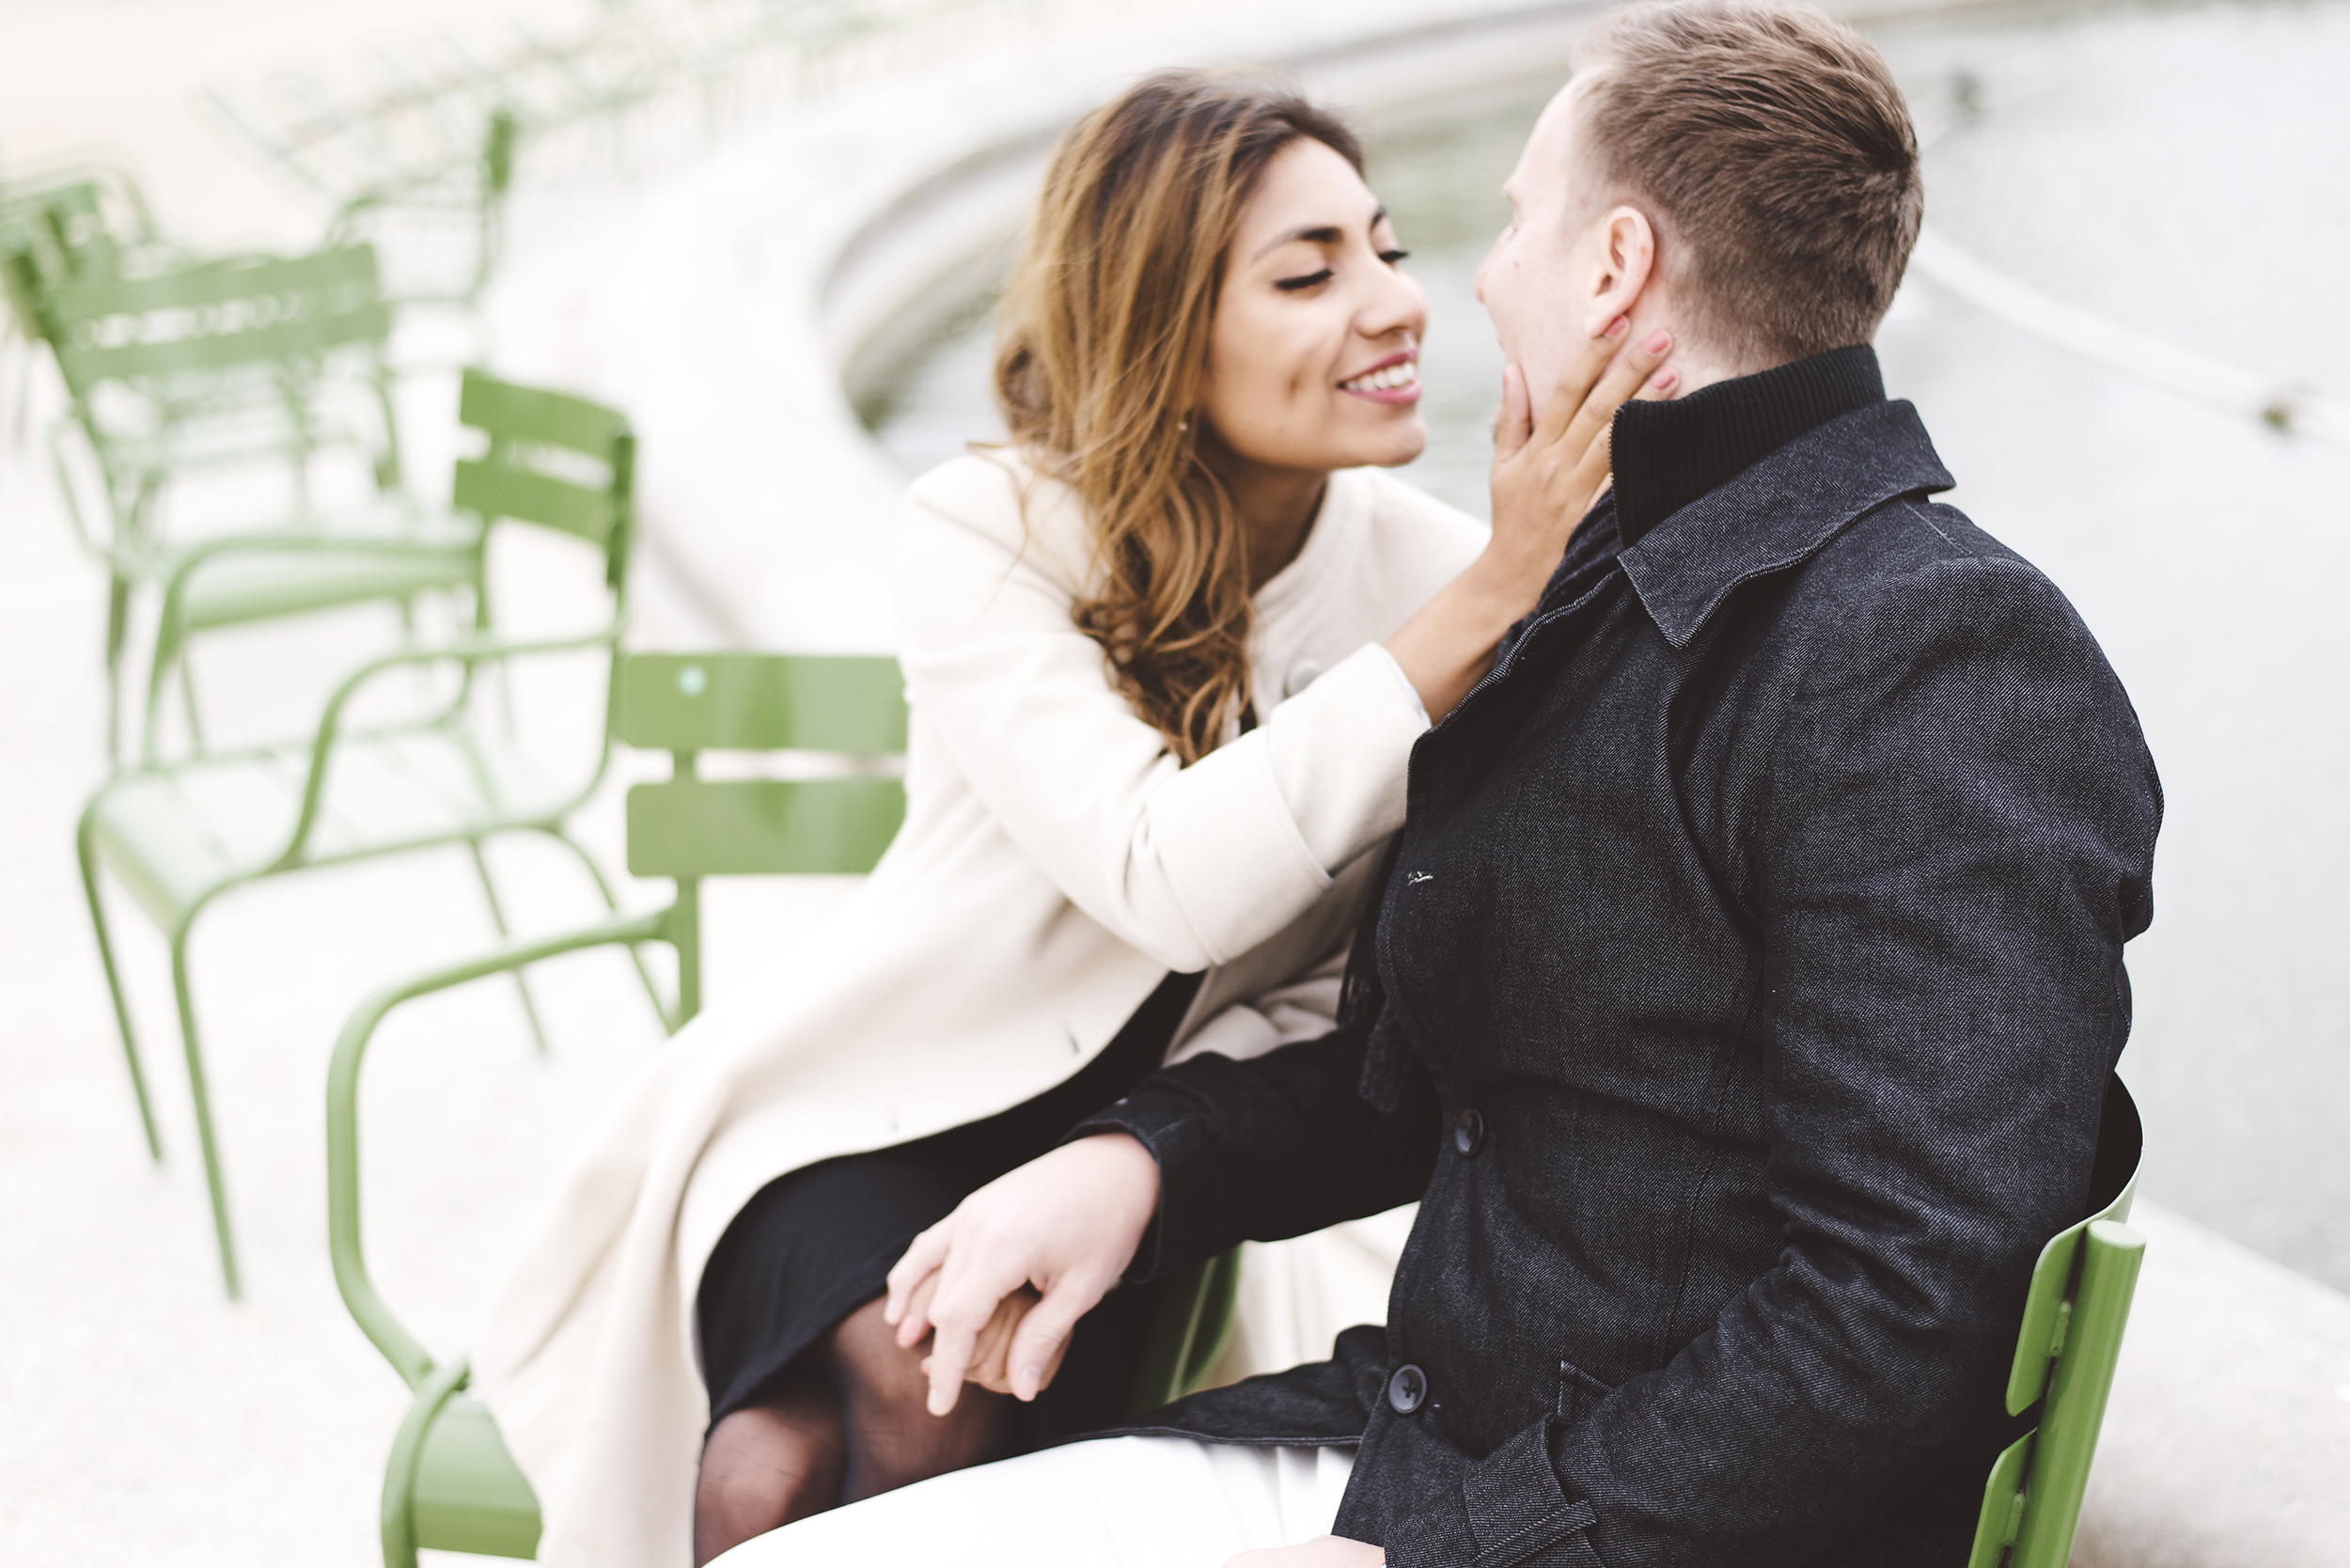 Couple-photoshoot-Anniversary-Paris-Louvre-Tuileries013.jpg